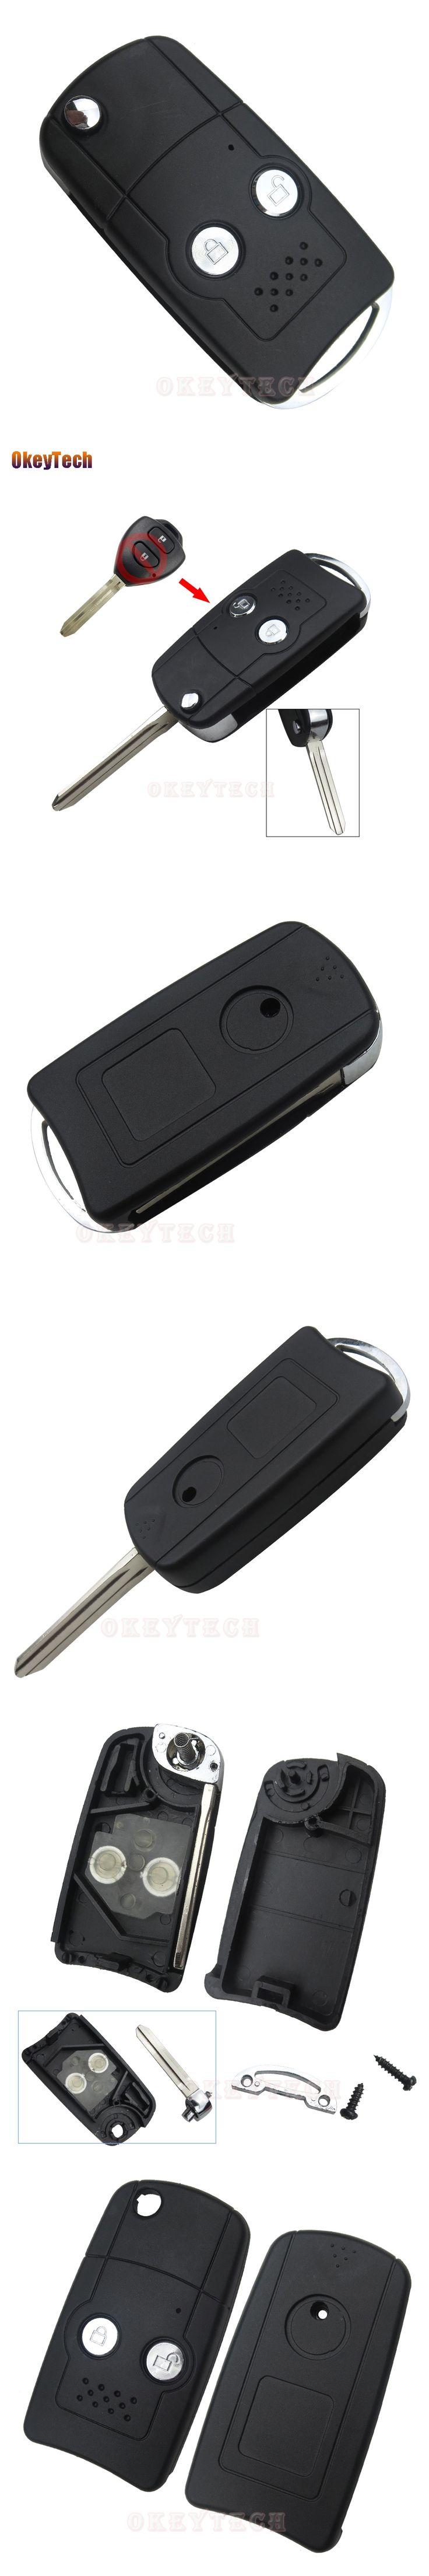 Best 25 auto key ideas on pinterest car key holder fiat stilo okeytech for toyota 2 button modified flip folding auto key blank remote car cover key fob fandeluxe Gallery